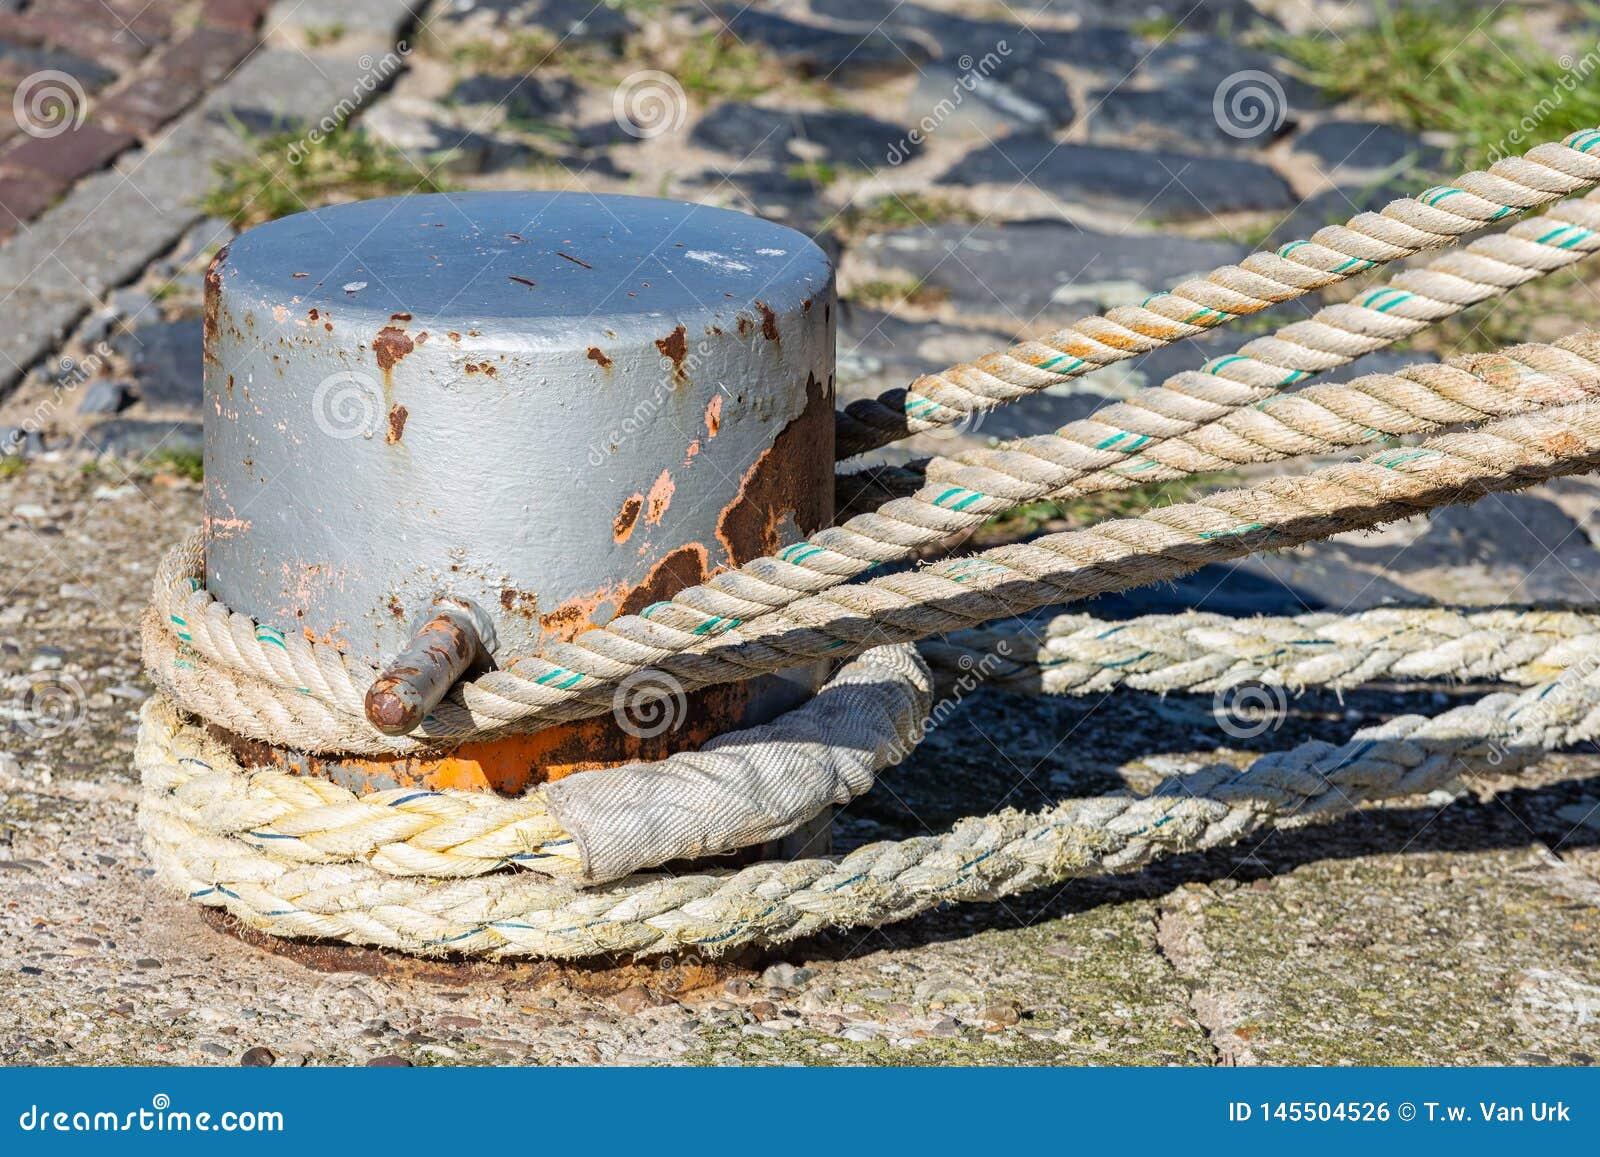 Mooring rope coiled around a bollard